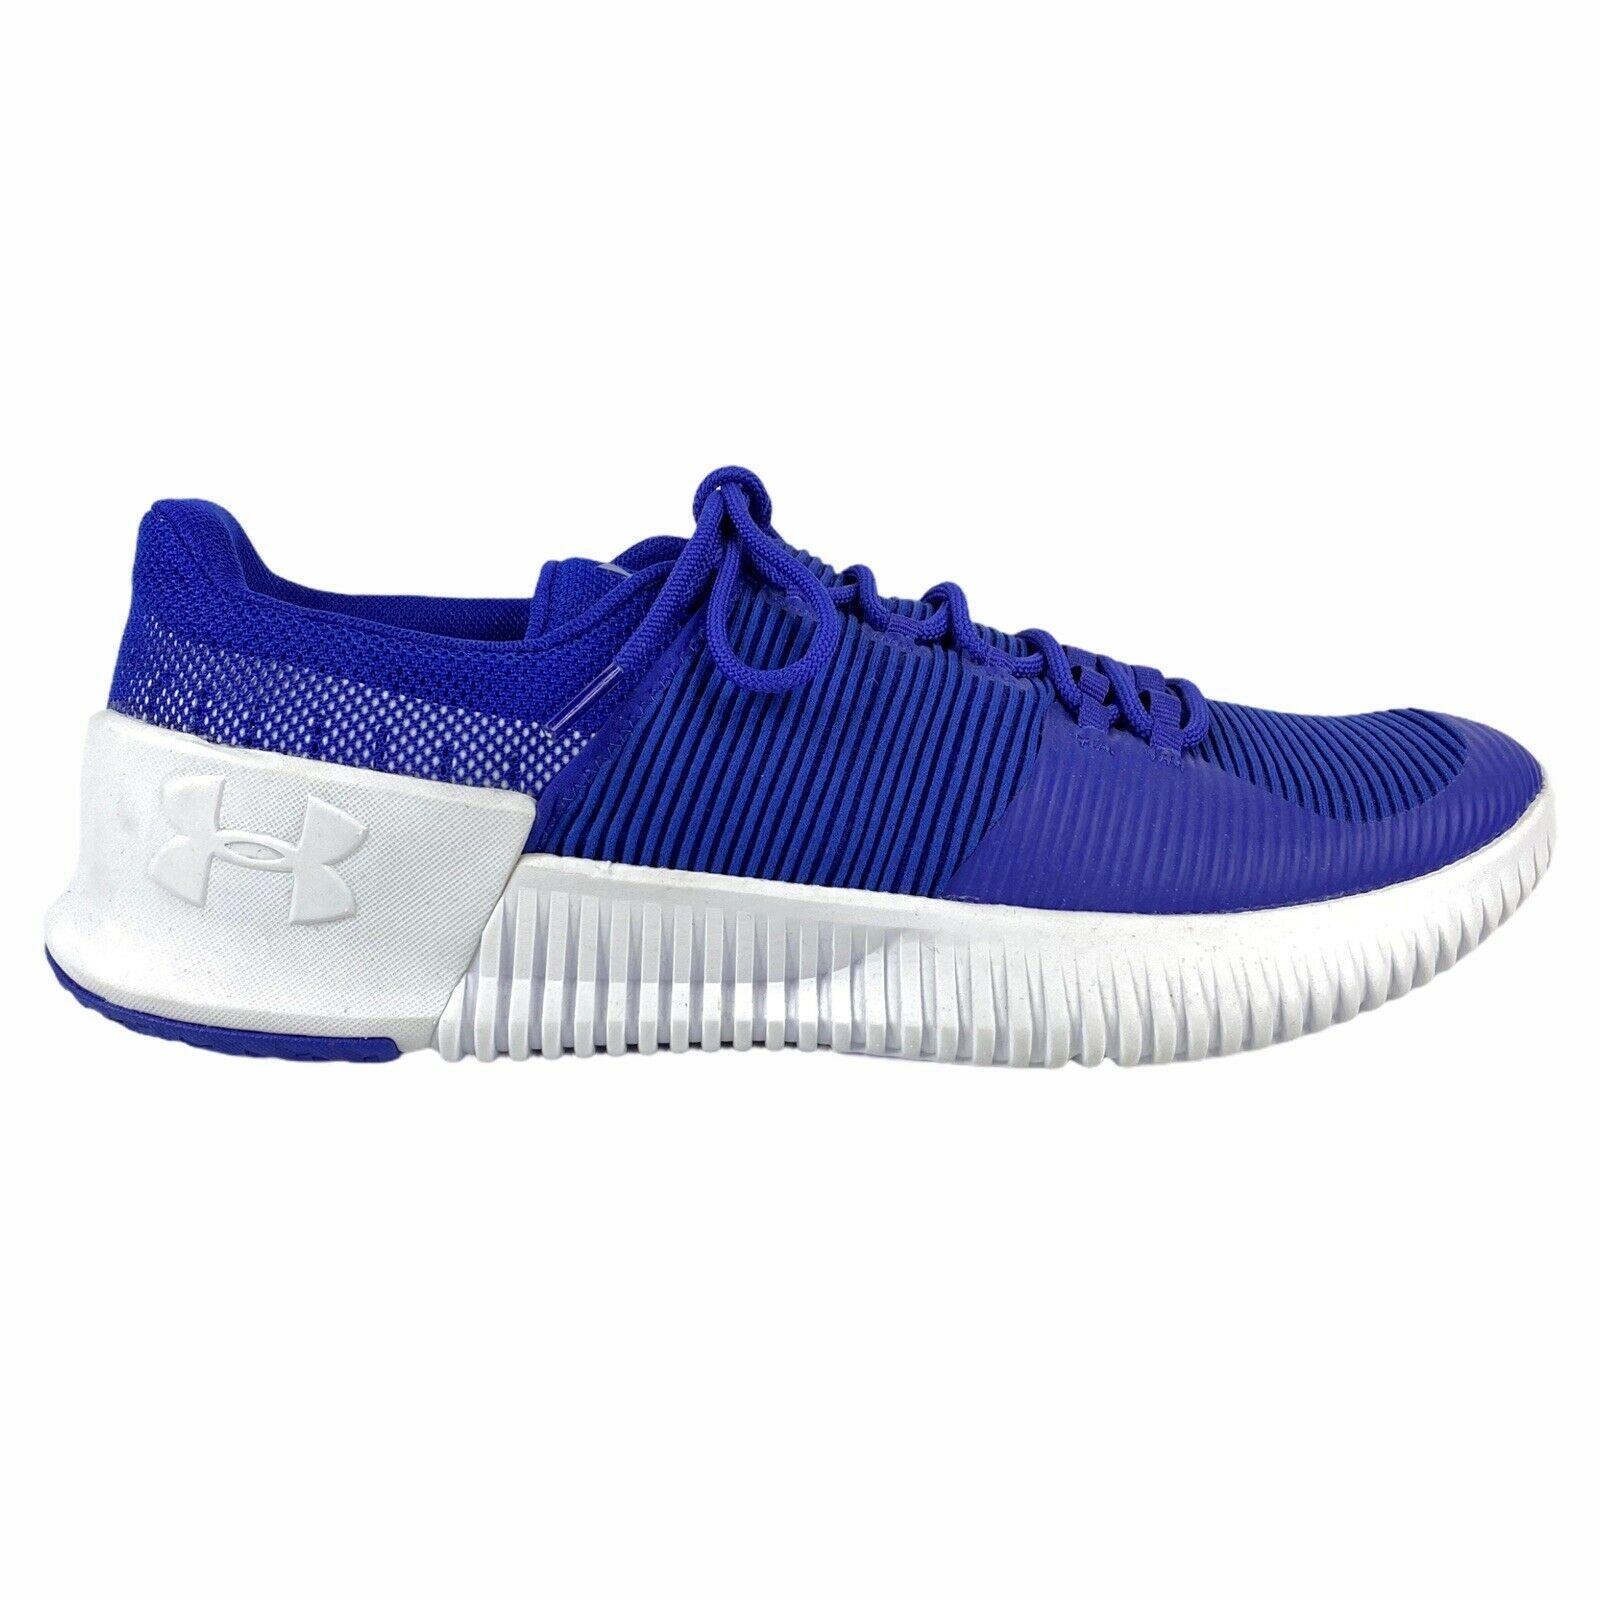 Under Armour Ultimate Speed Training Sneaker Shoe Blue 3000329-500 Men Sz 12.5 M